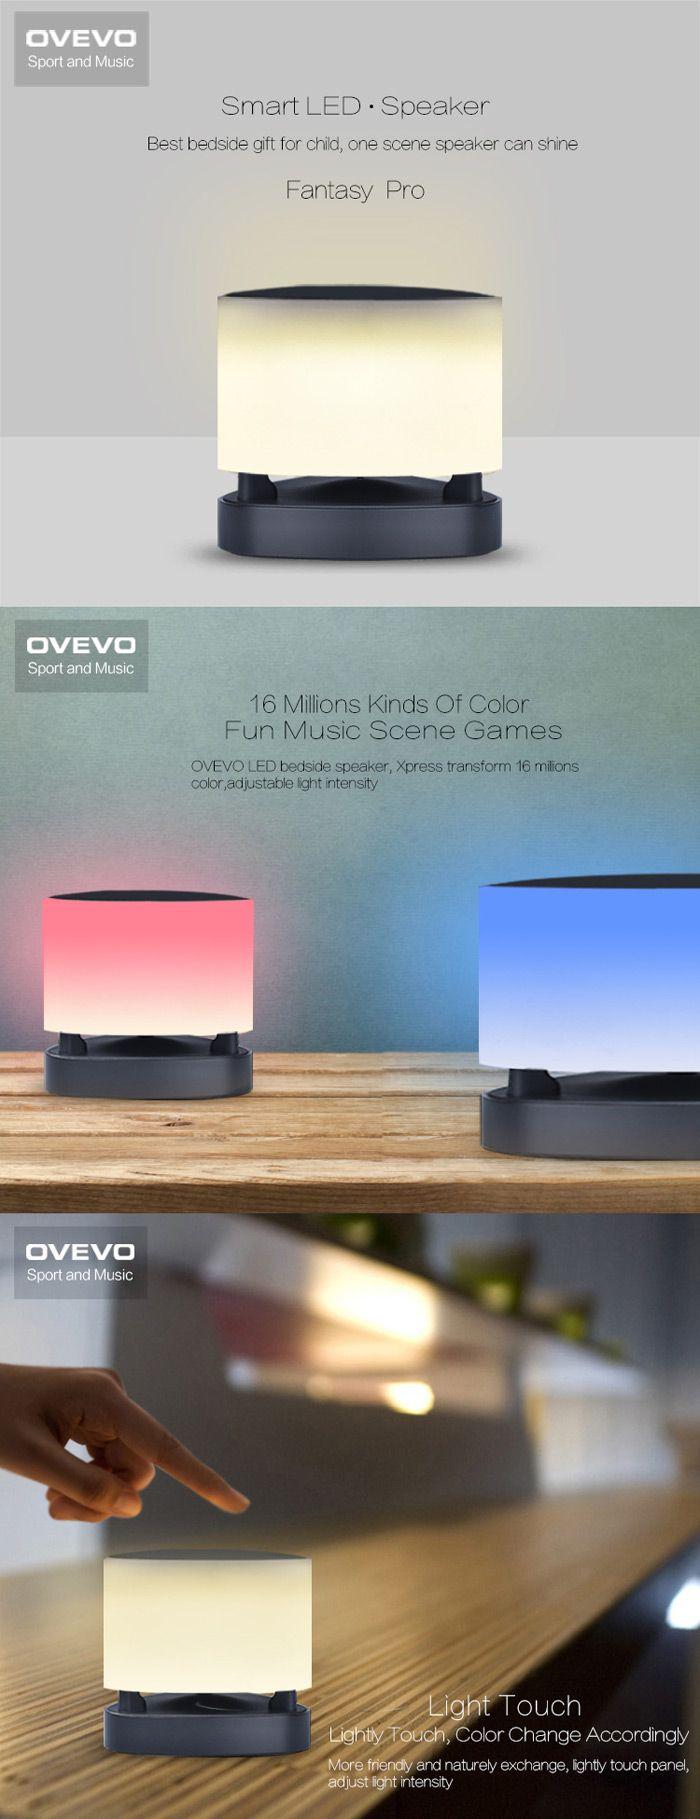 OVEVO Fantasy Pro Smart Bluetooth 4.0 Music Speaker Lamp LED Light Intelligent Bulb